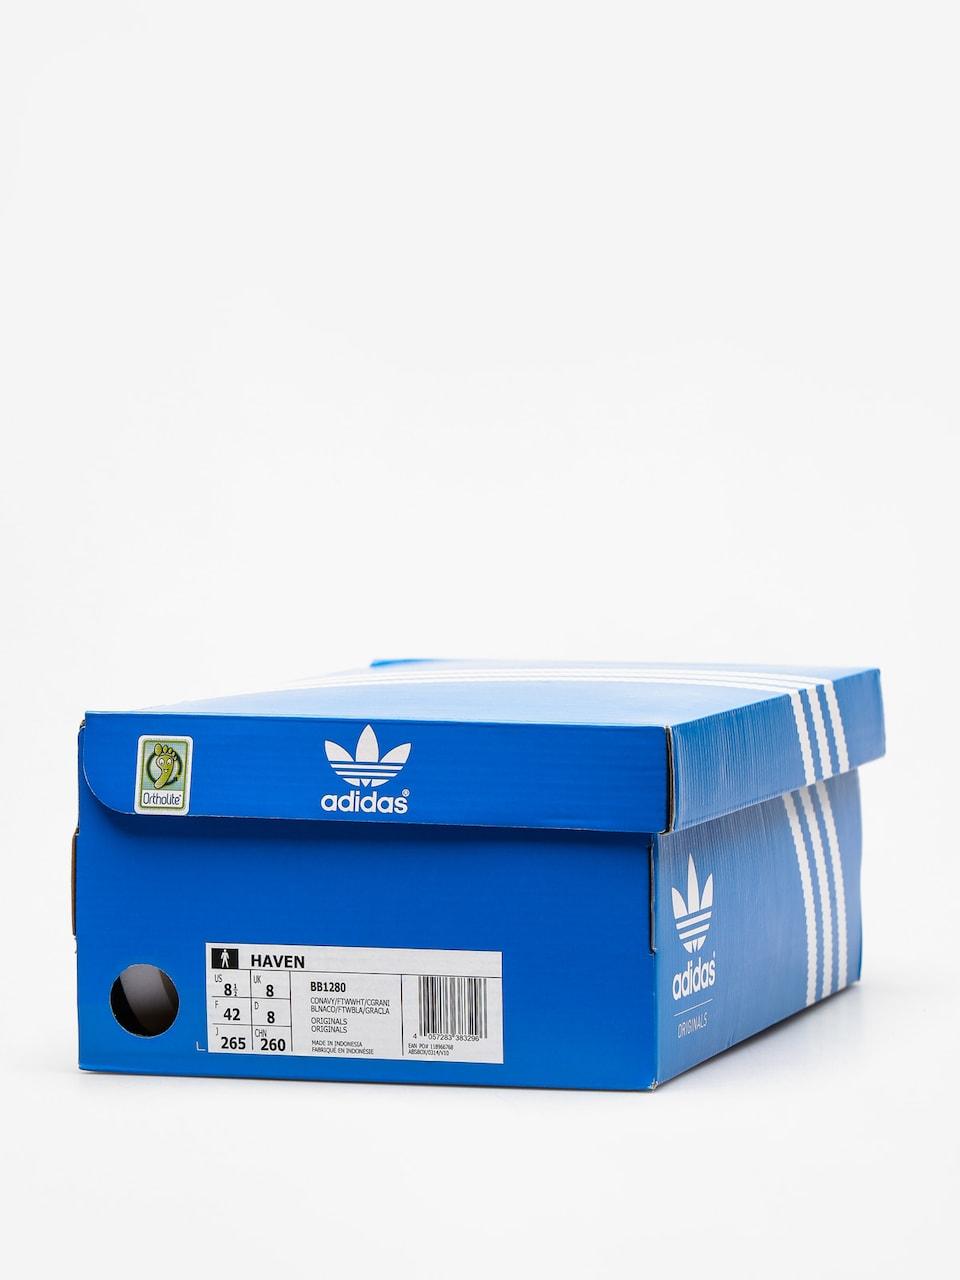 Buty adidas Haven (conavyftwwhtcgrani)